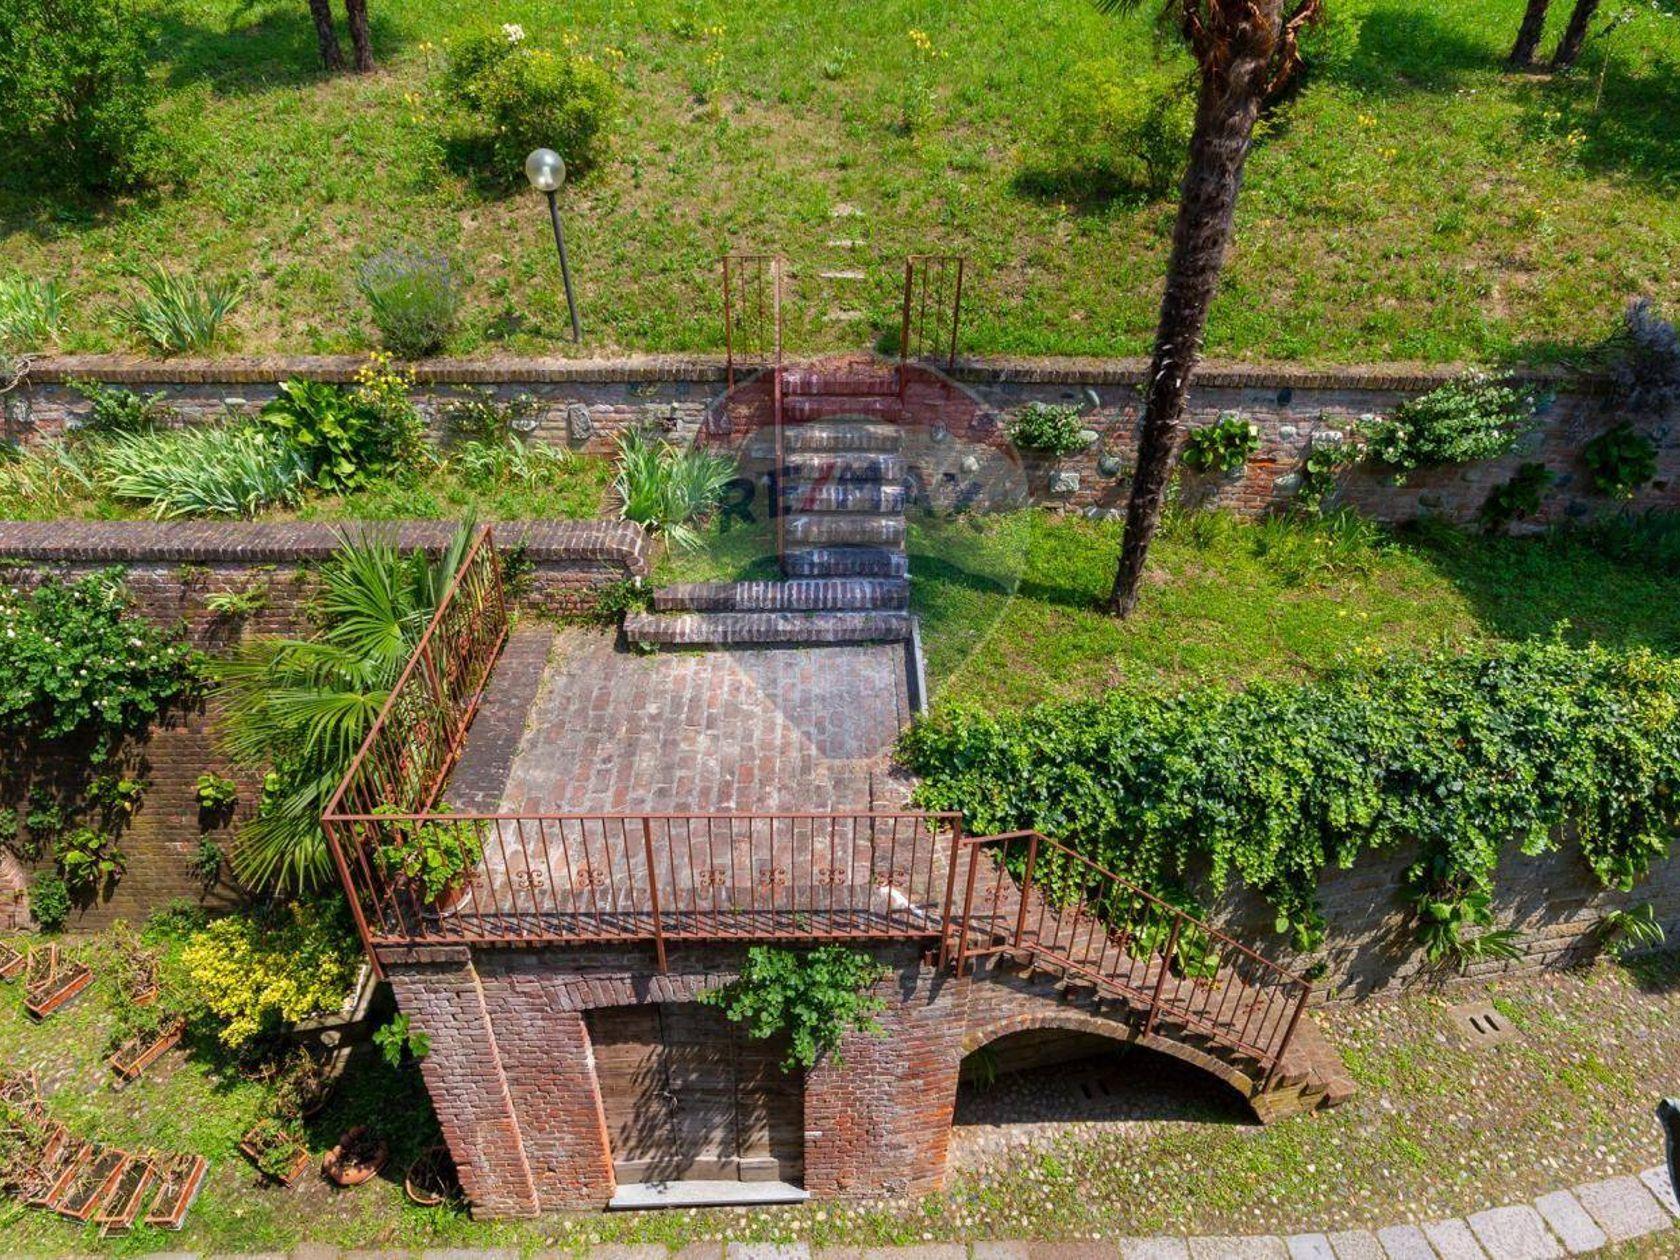 Casa Indipendente Torino-precollina Collina, Torino, TO Vendita - Foto 4